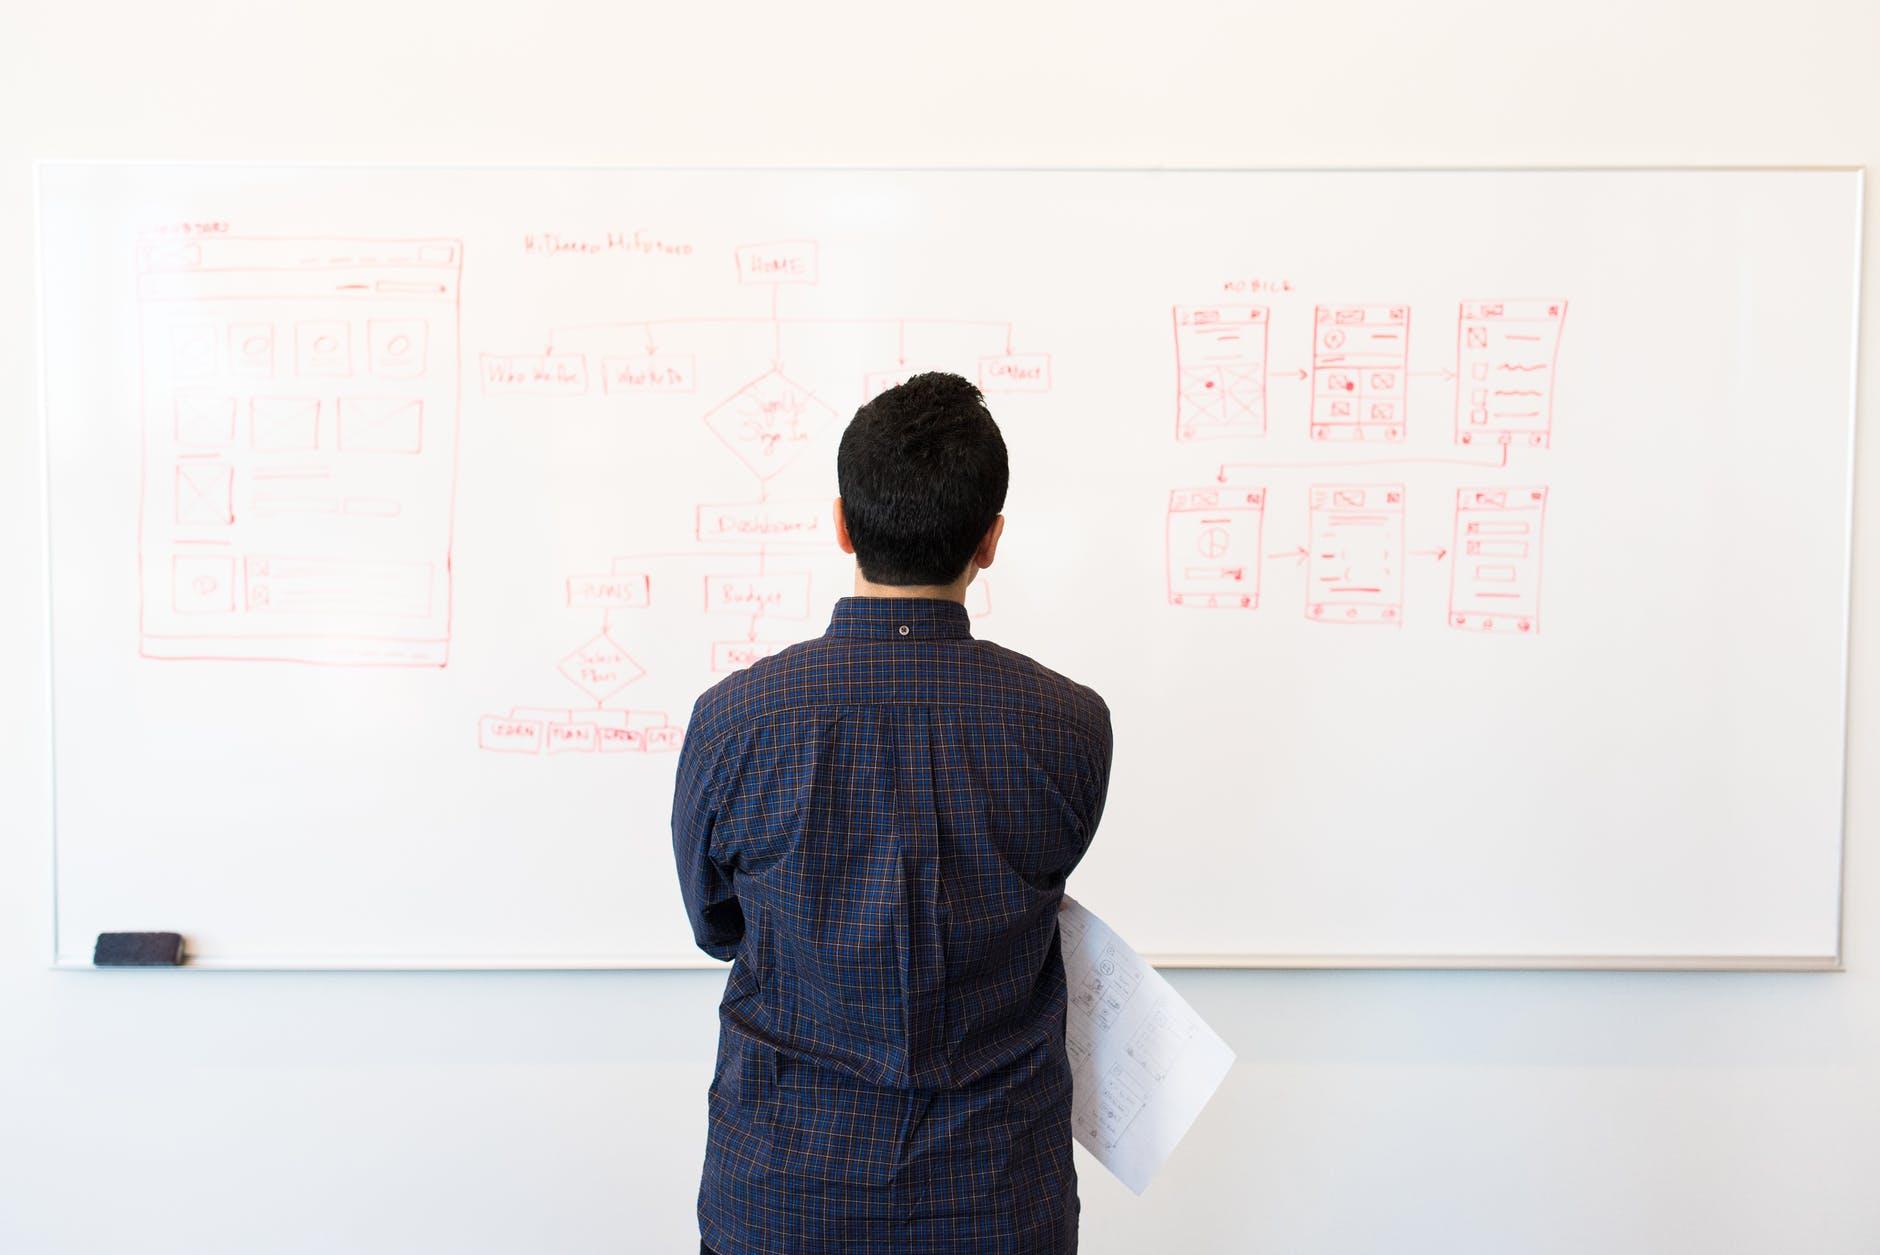 decision making data